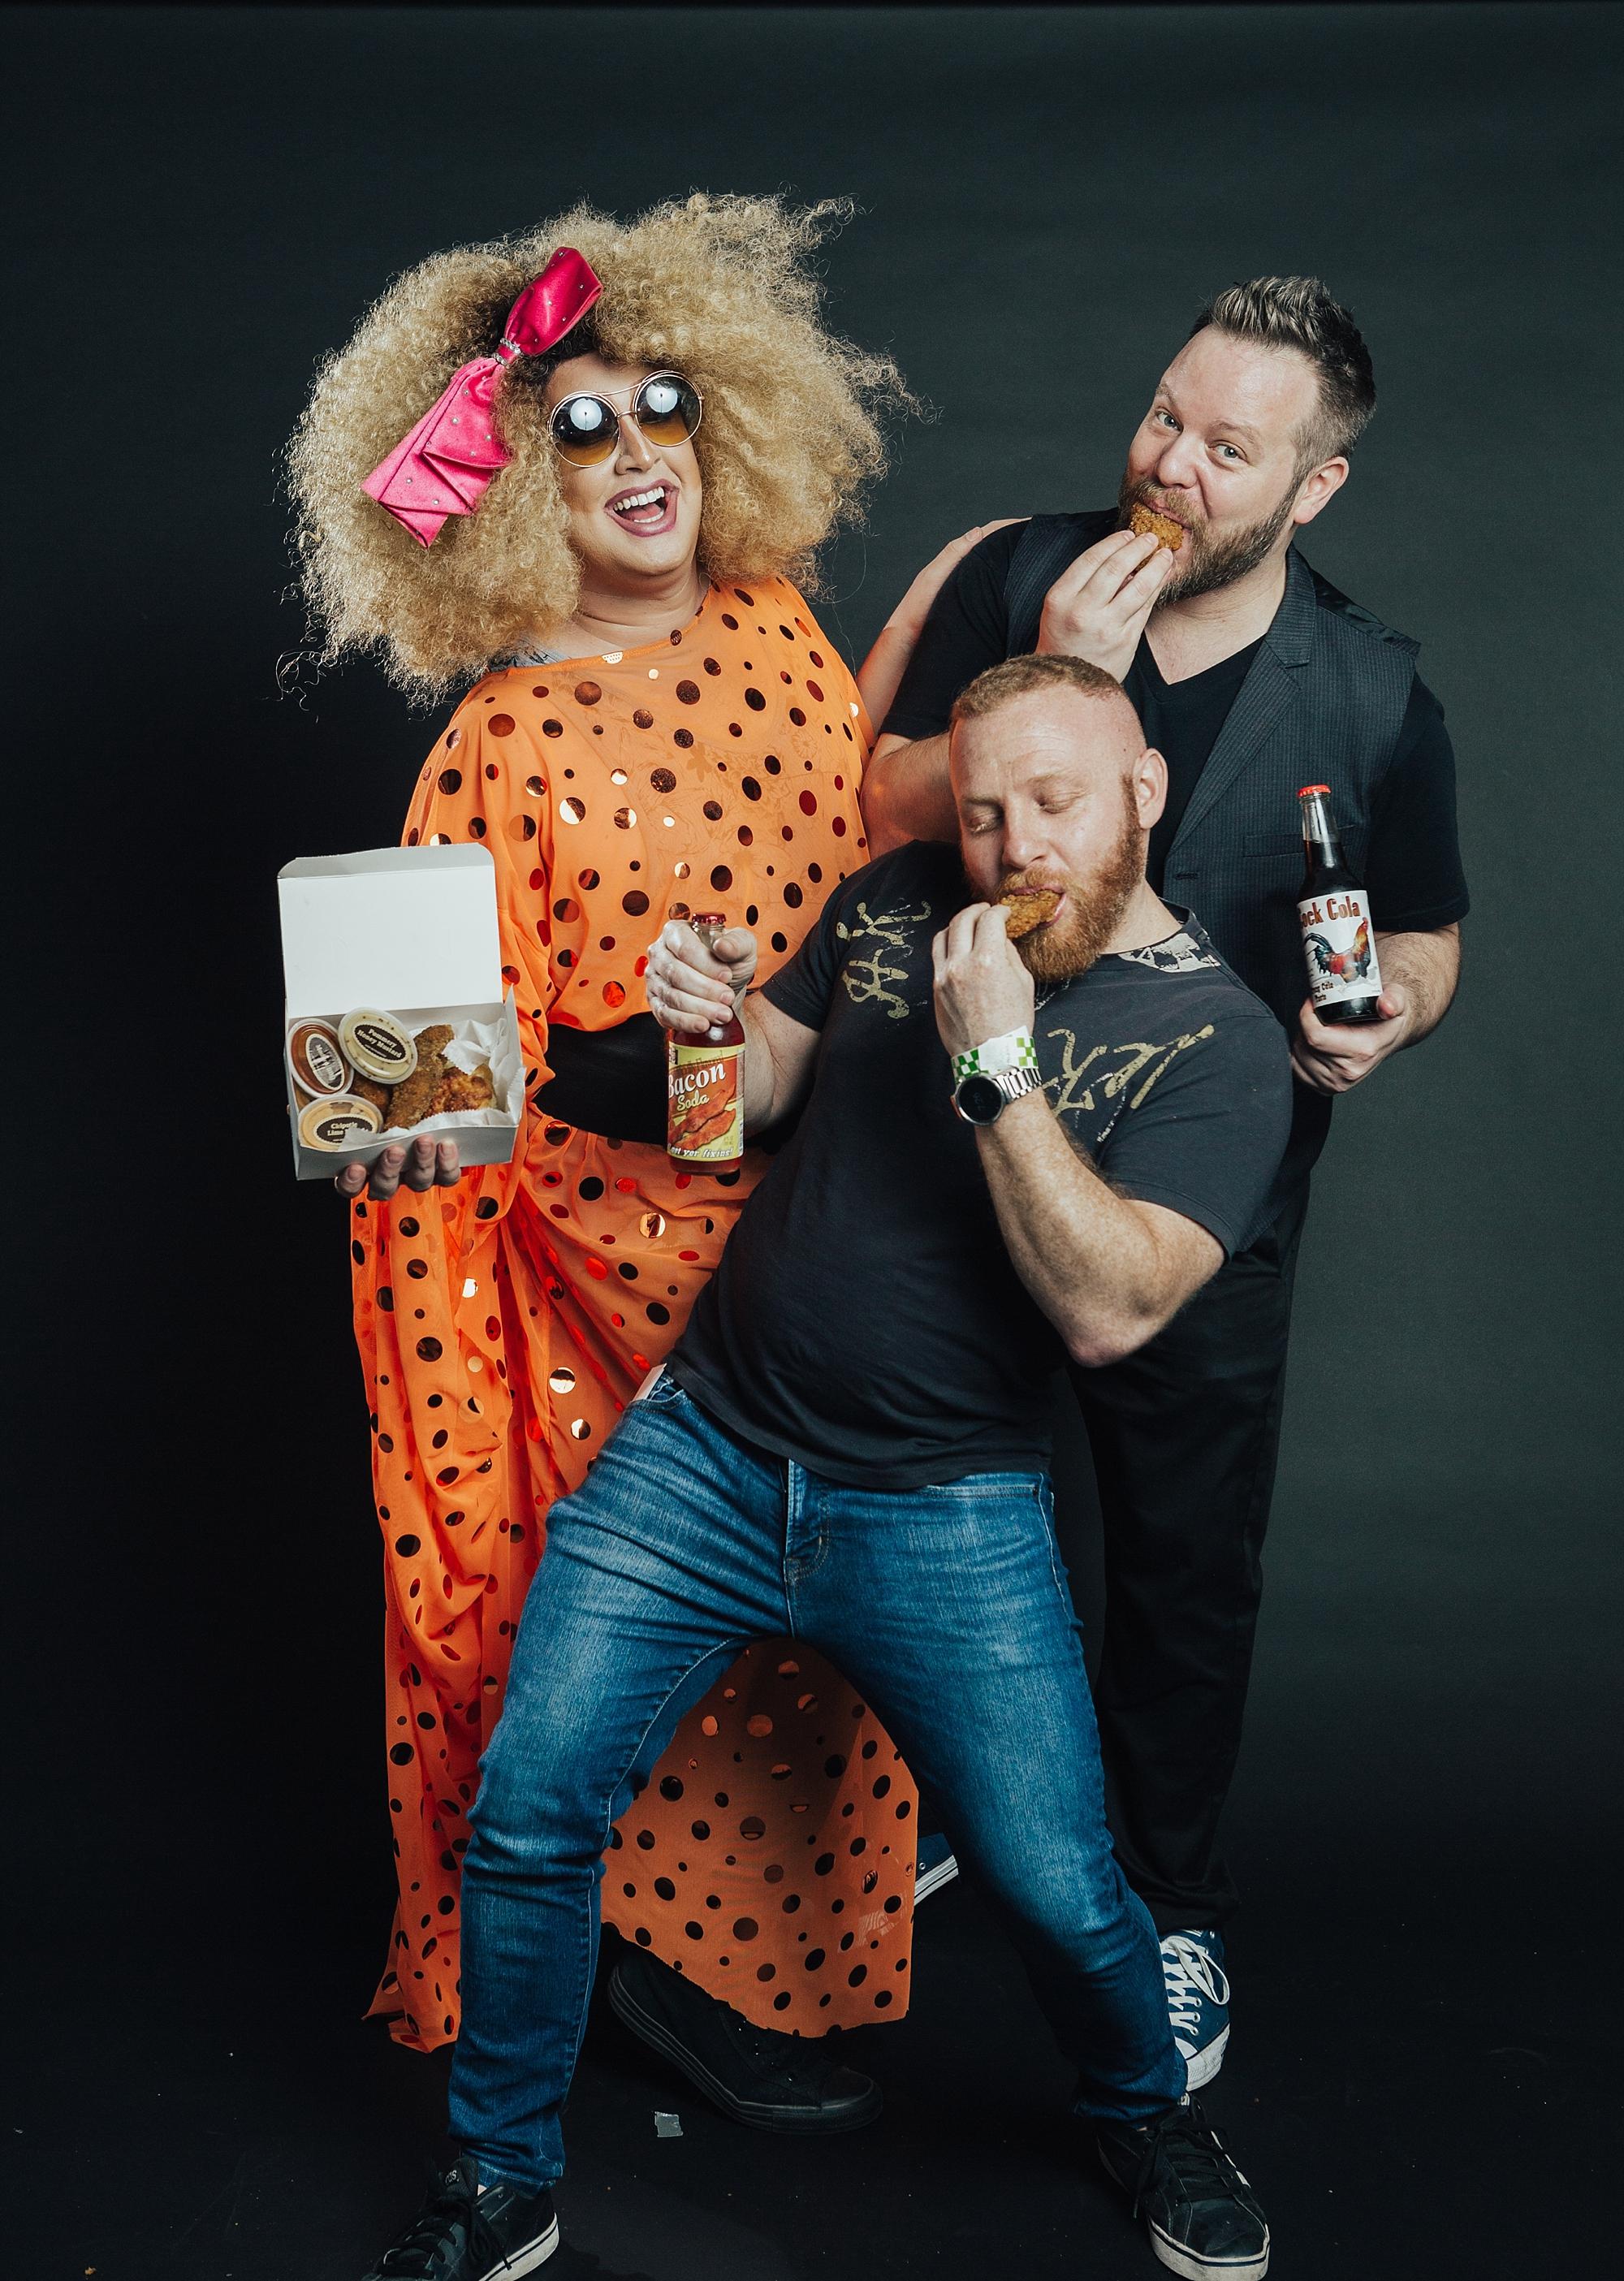 PGMC_Philadelphia_Gay_Mens_Chorus_Joe_Mac_Creative_LGBT_Photography_Voyeur_Gay_Philadelphia_0011.jpg